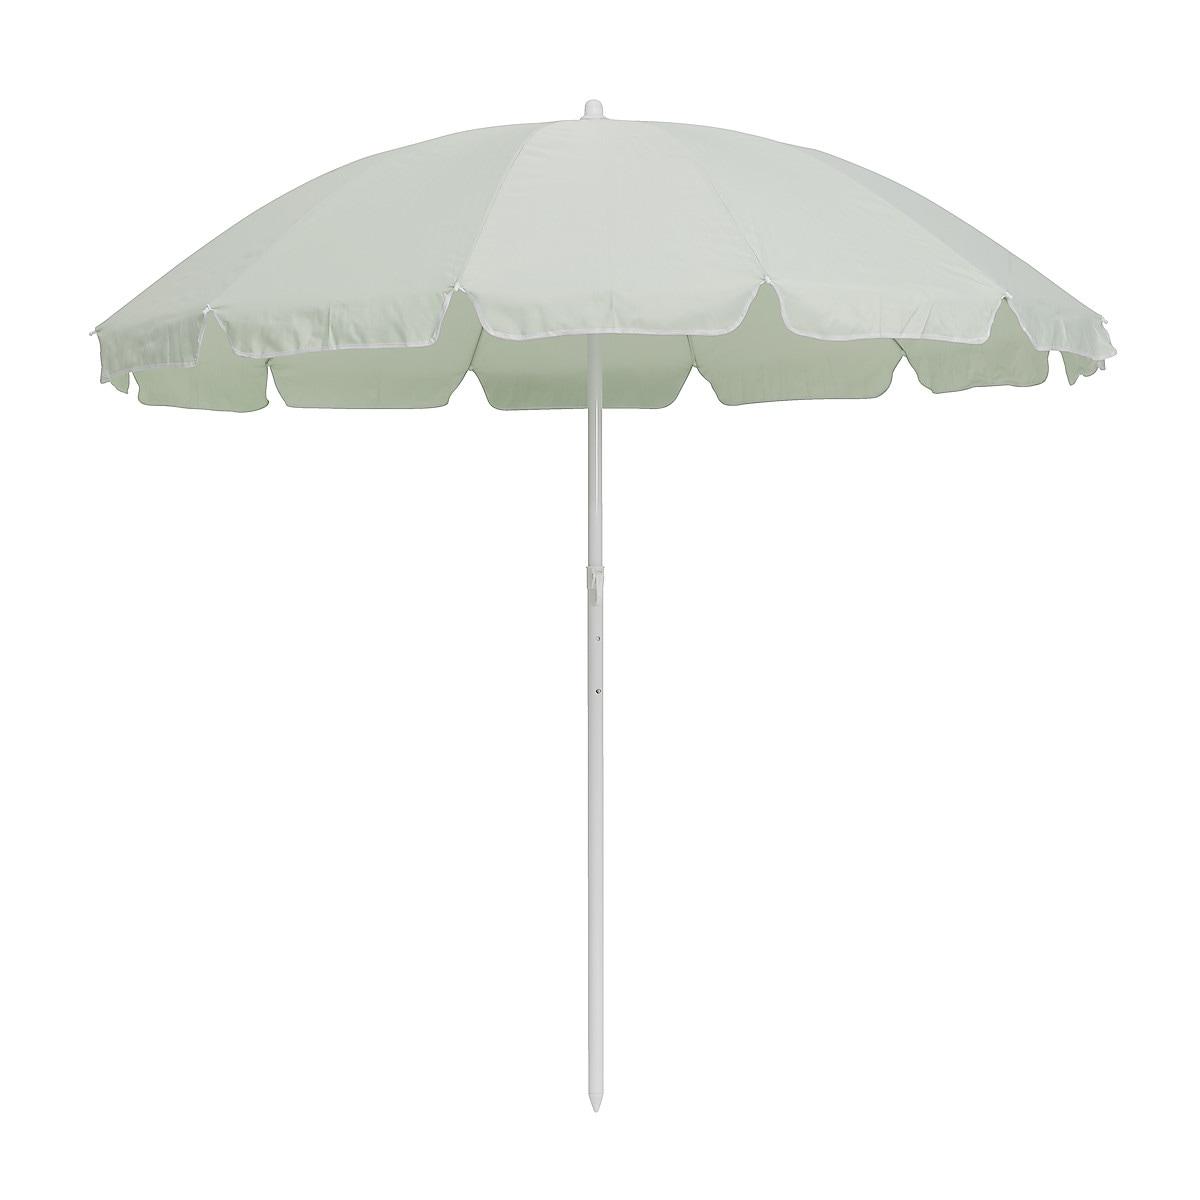 Aurinkovarjo Ø 185 cm, vihreä